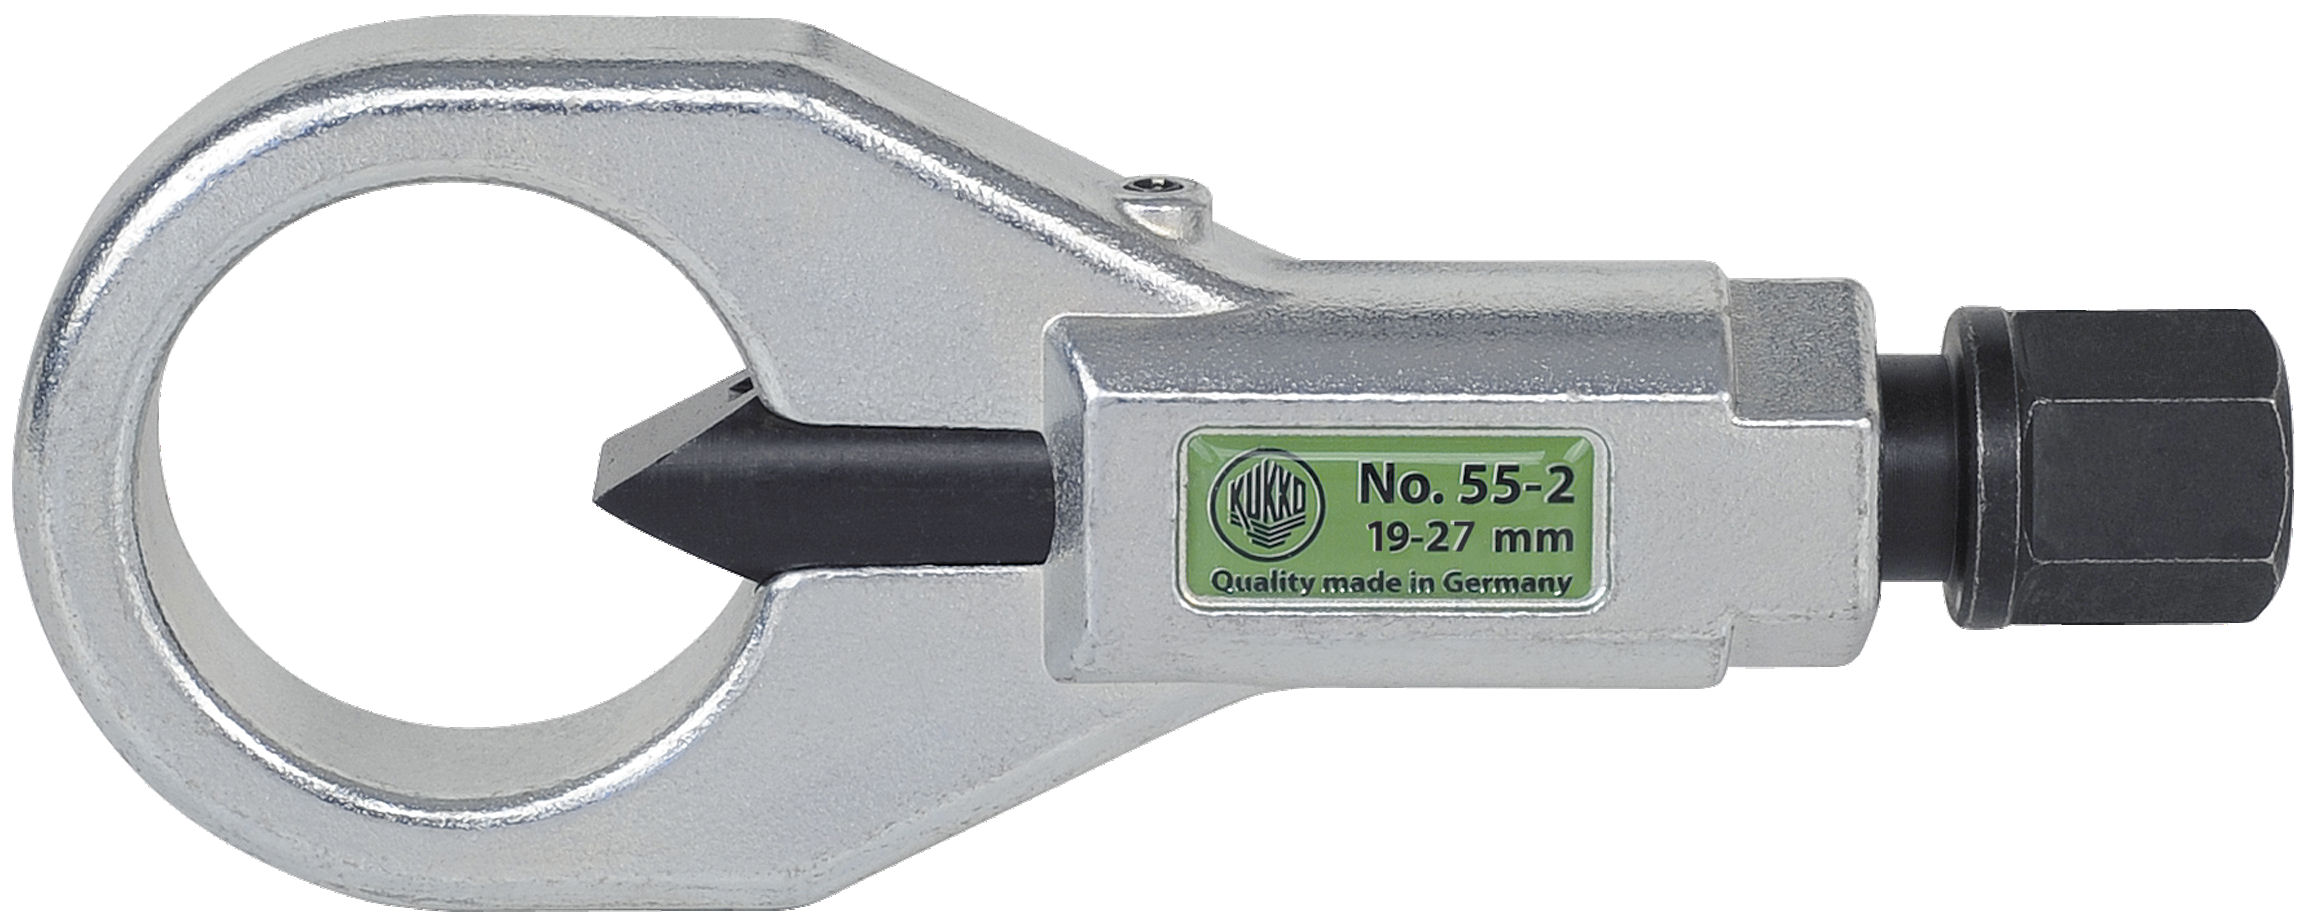 55-2 Kukko Single Edged Mechanical Nut Splitter for Nuts 19-27mm image 2